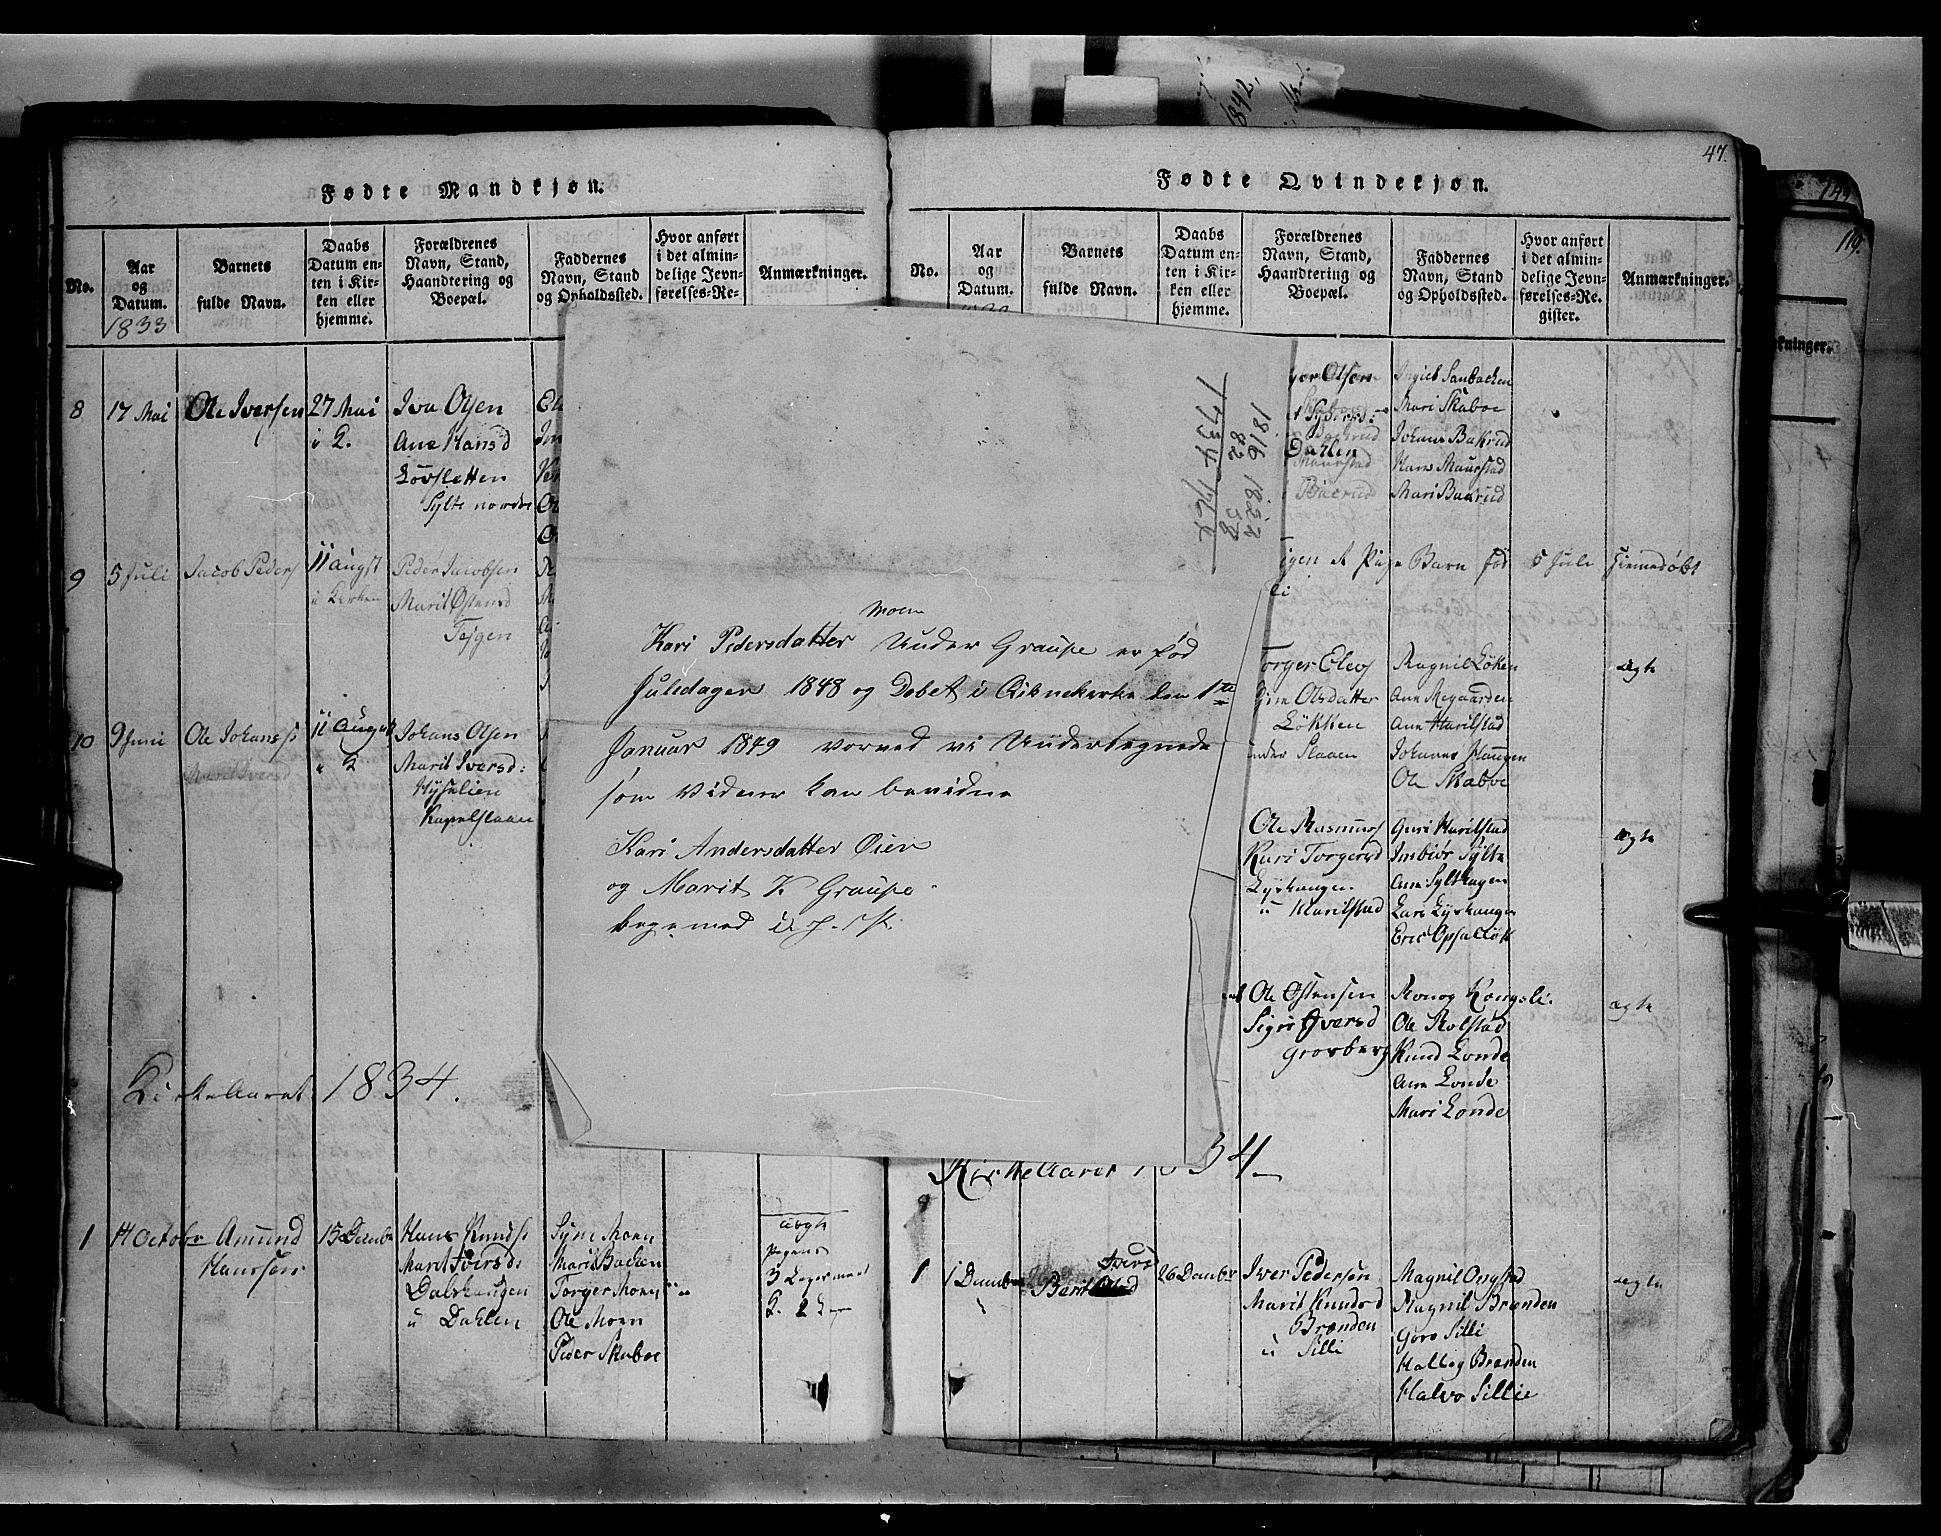 SAH, Fron prestekontor, H/Ha/Hab/L0003: Klokkerbok nr. 3, 1816-1850, s. 47